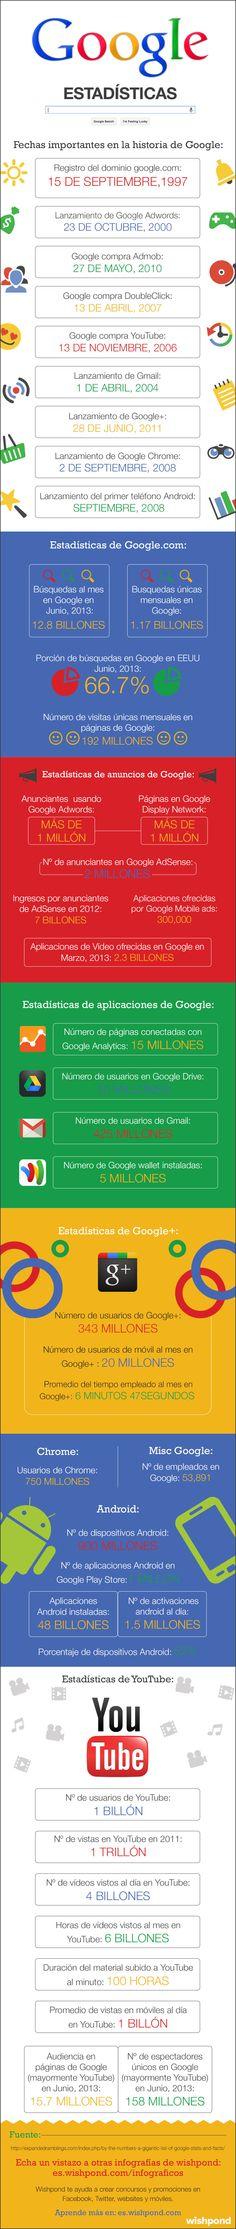 41 Estadisticas 2013 De Google Que No Sabías [infografía]